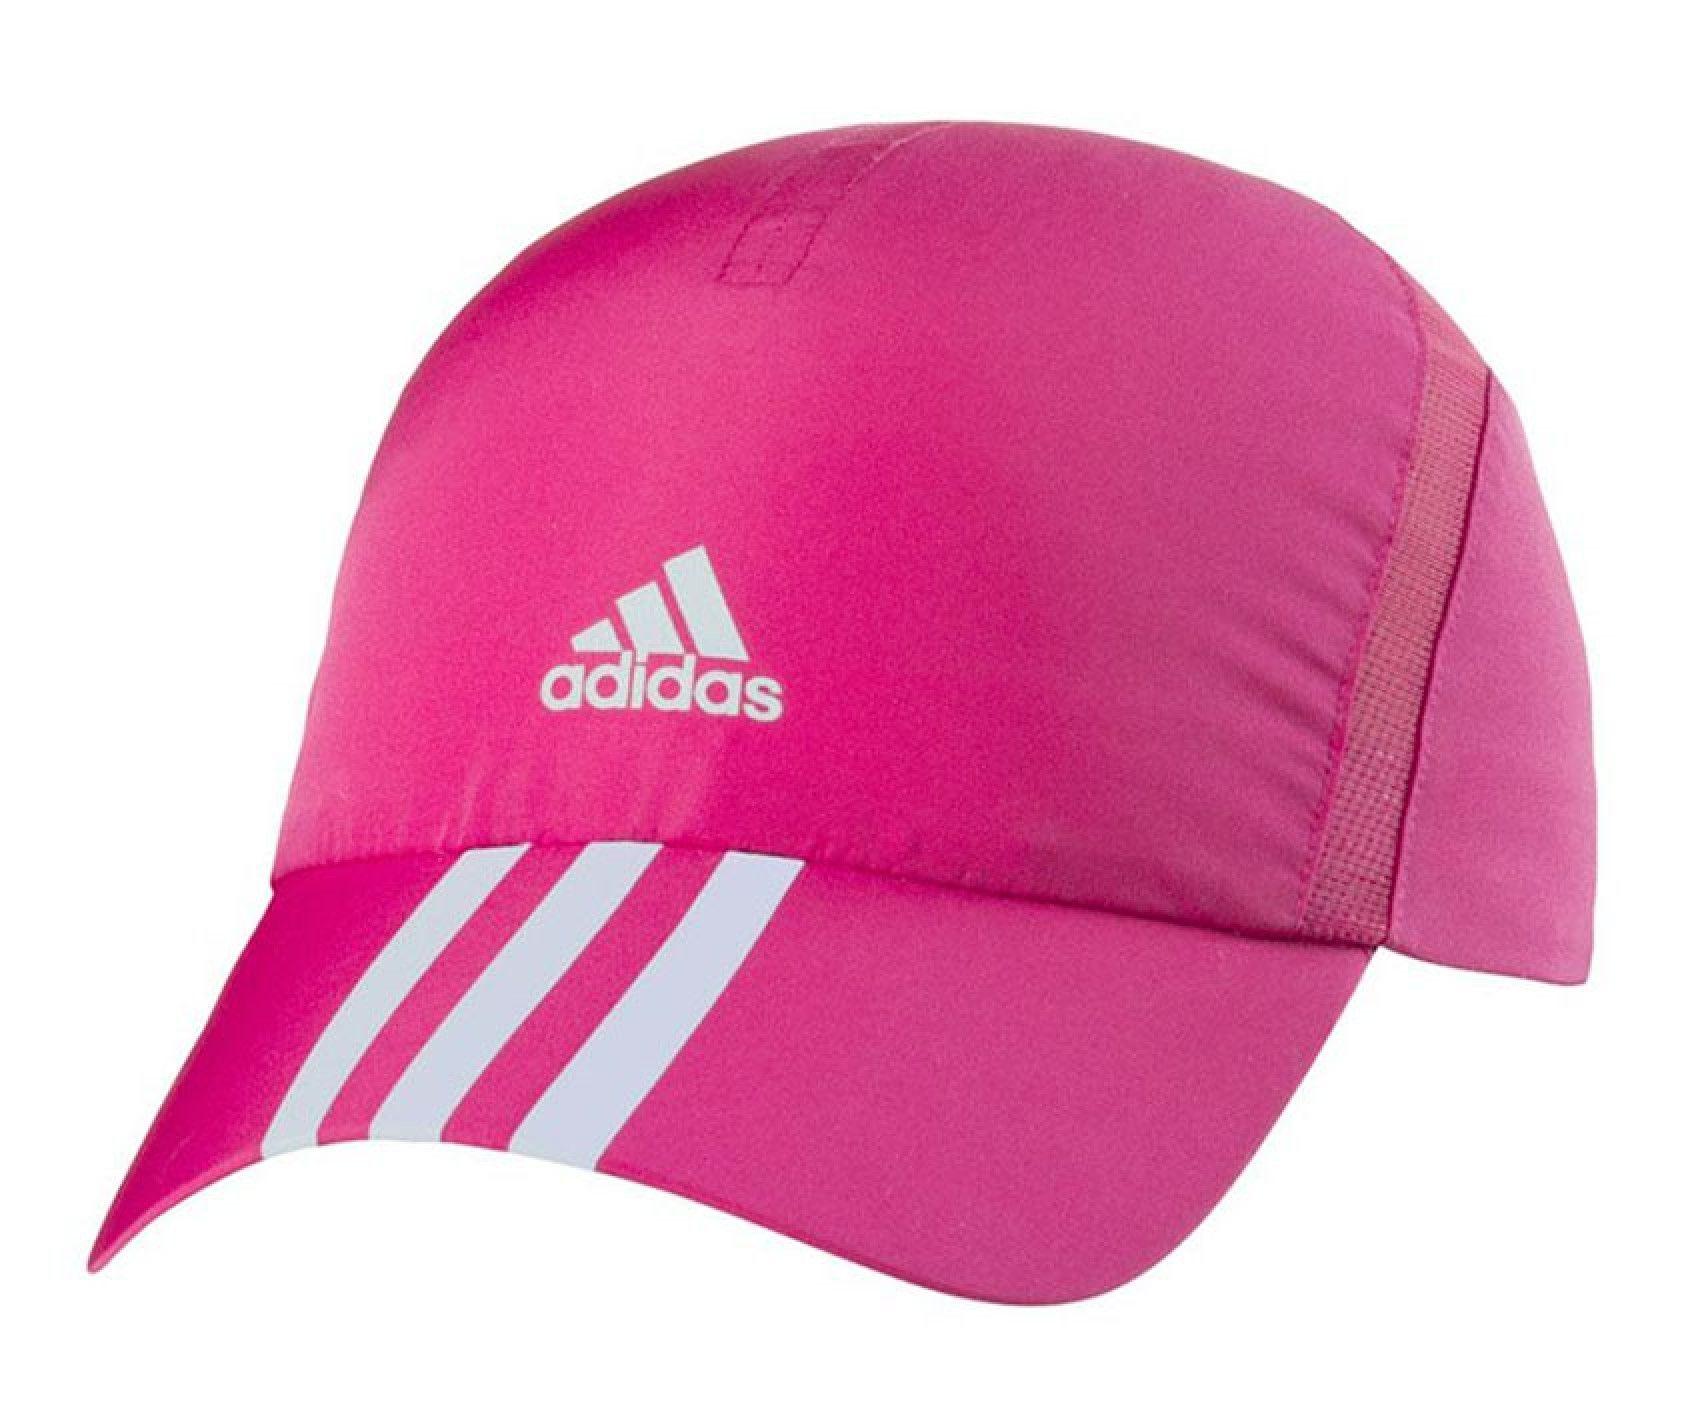 adidas gorra rosa